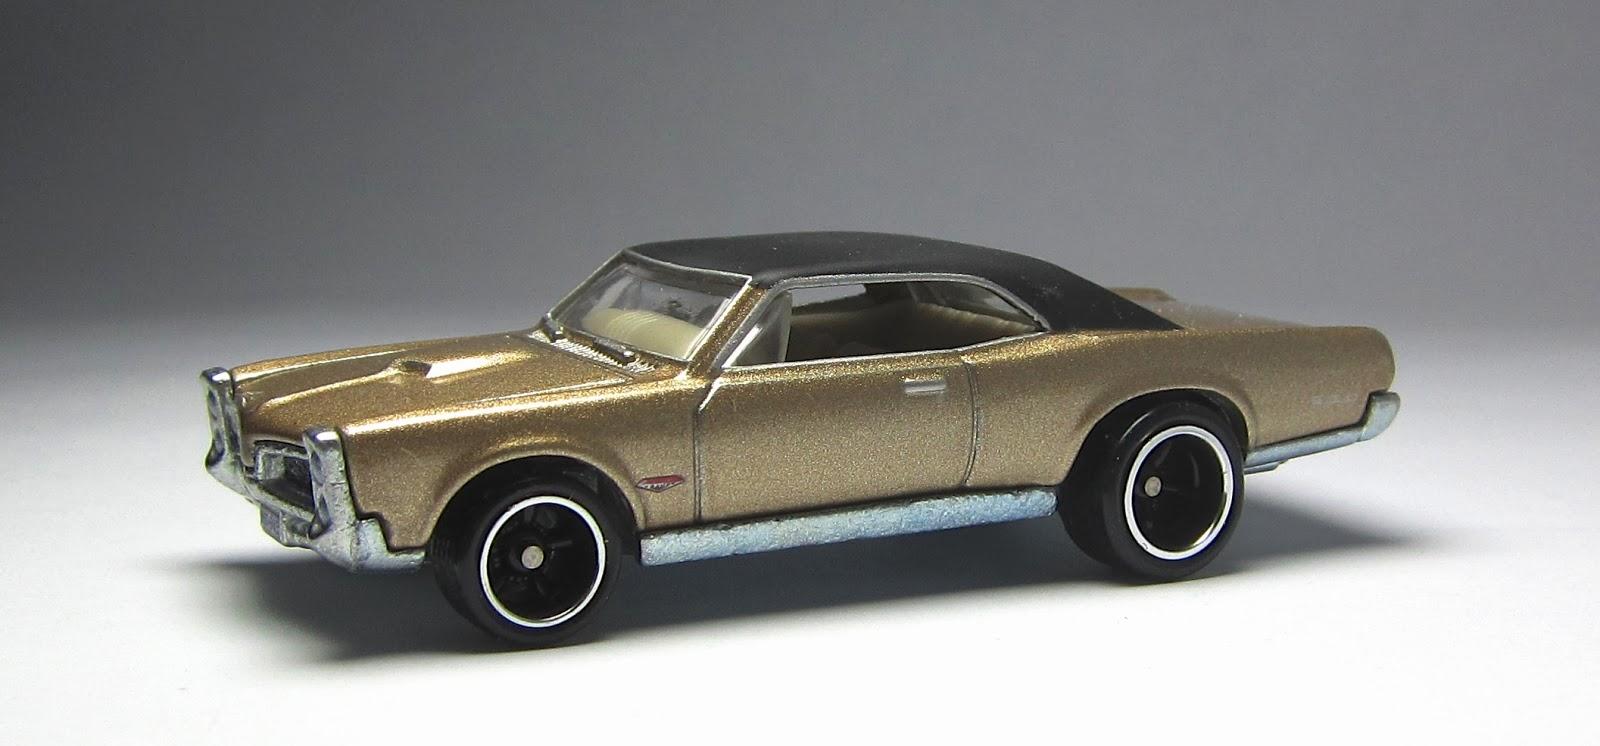 67 gto convertible Hot pontiac wheels